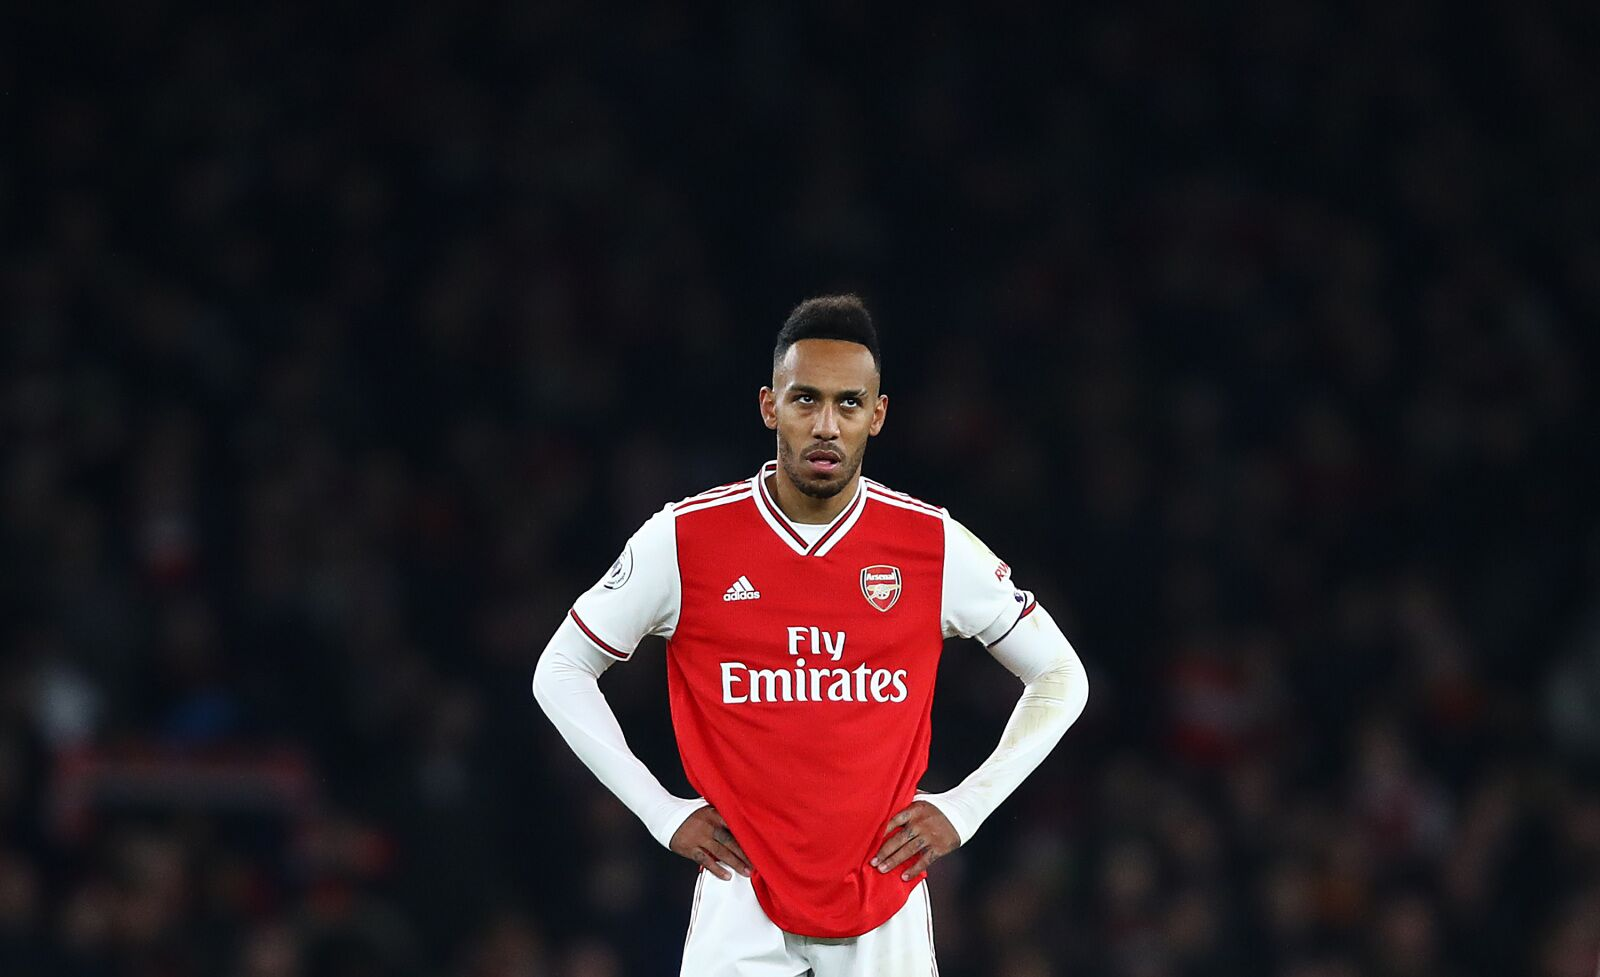 Arsenal: Sell Pierre-Emerick Aubameyang, yes, but don't loan him